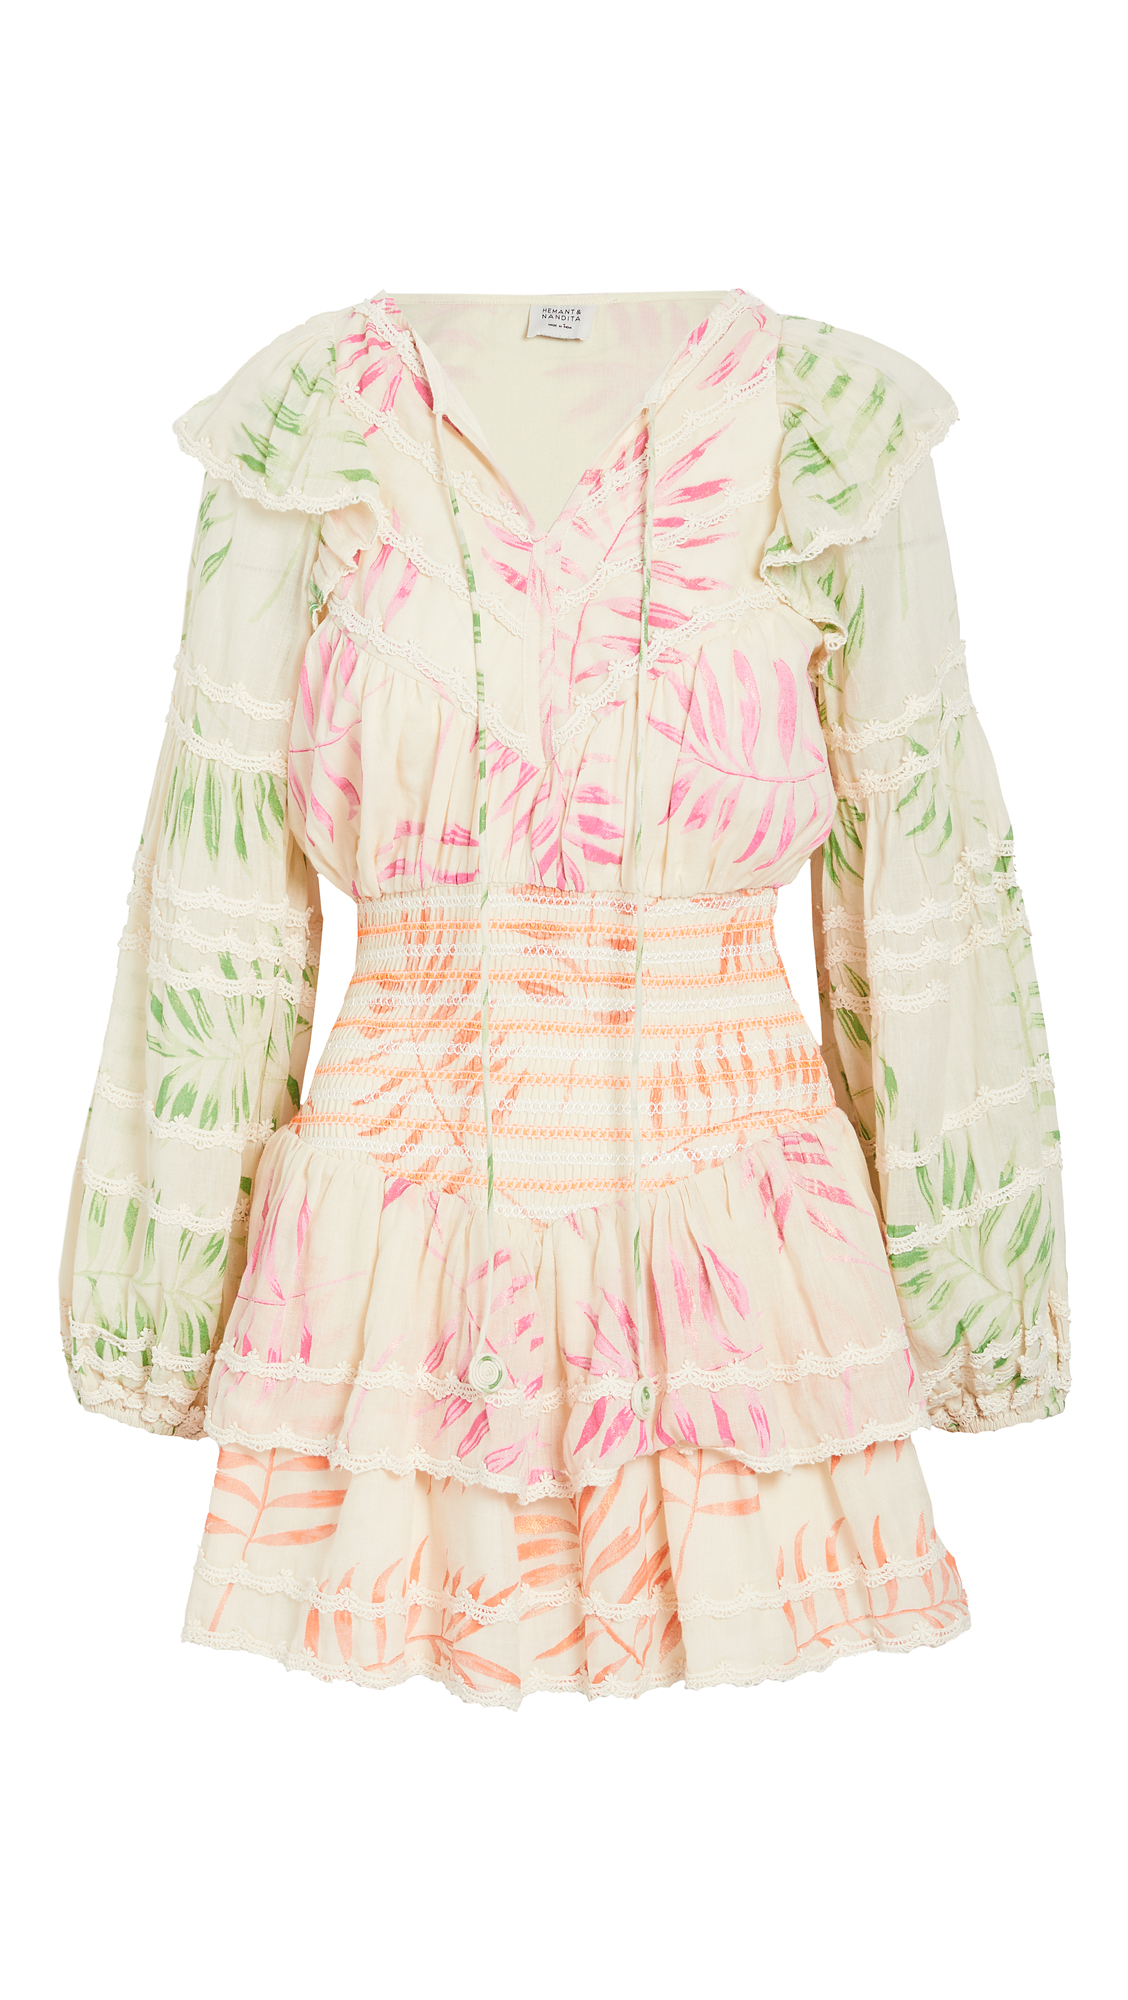 Hemant and Nandita Dream Dress